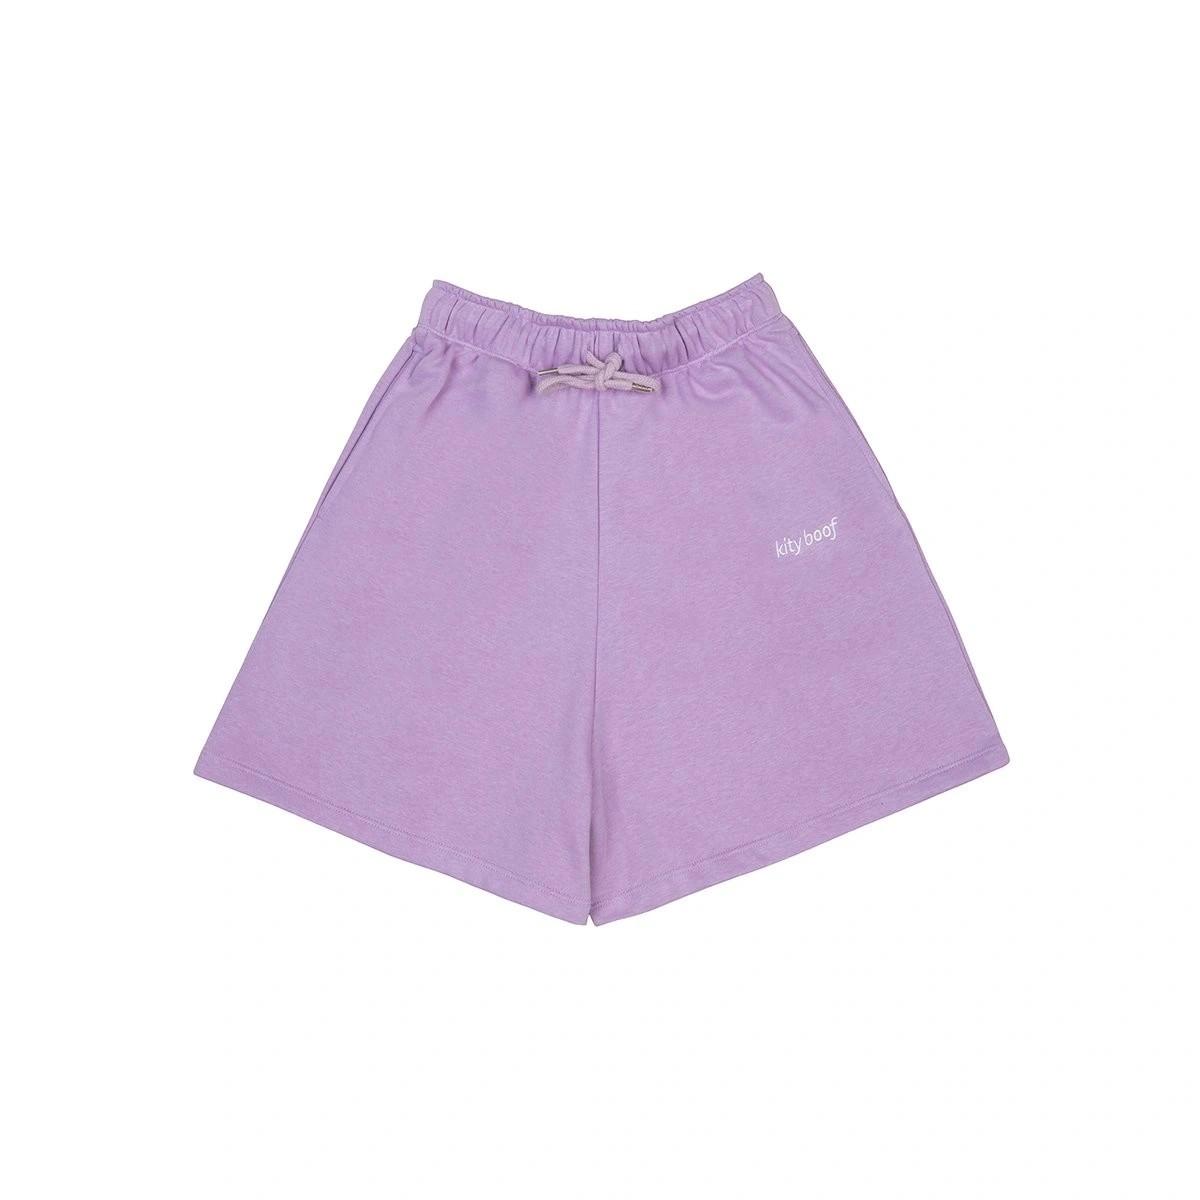 Kity Boof Short Purple